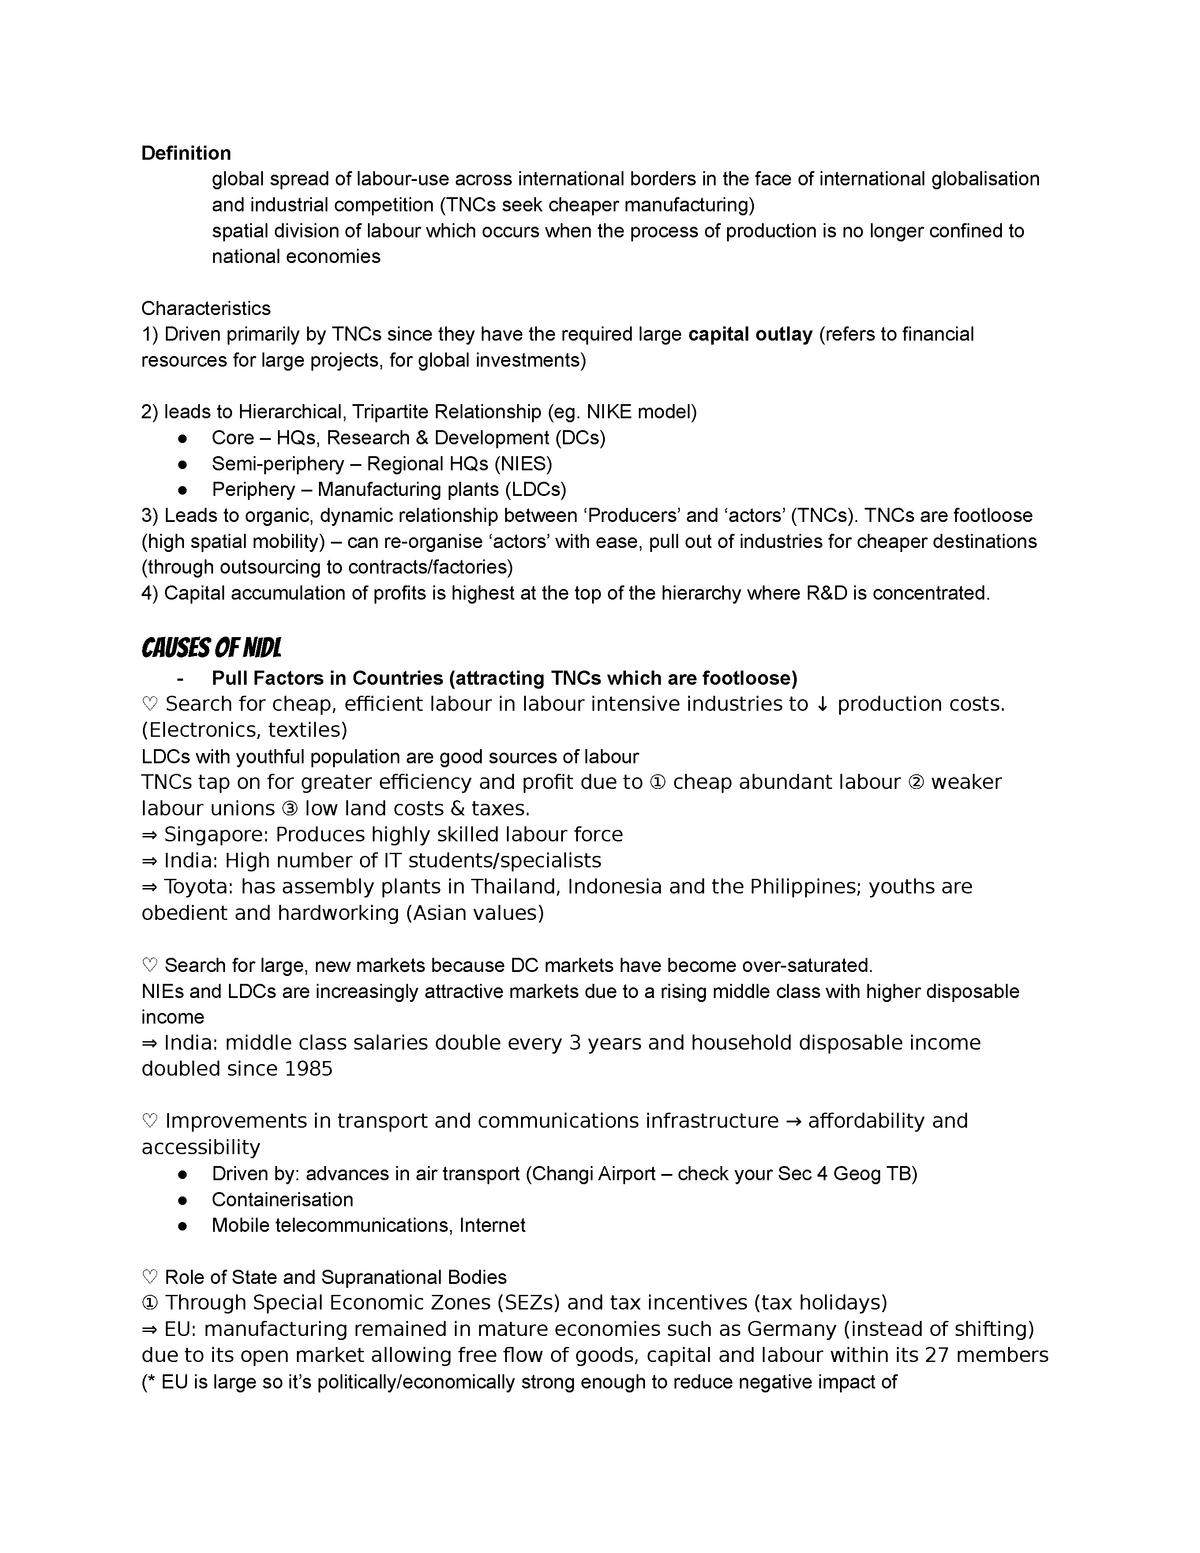 NIDL Summary - Space and Place - StuDocu